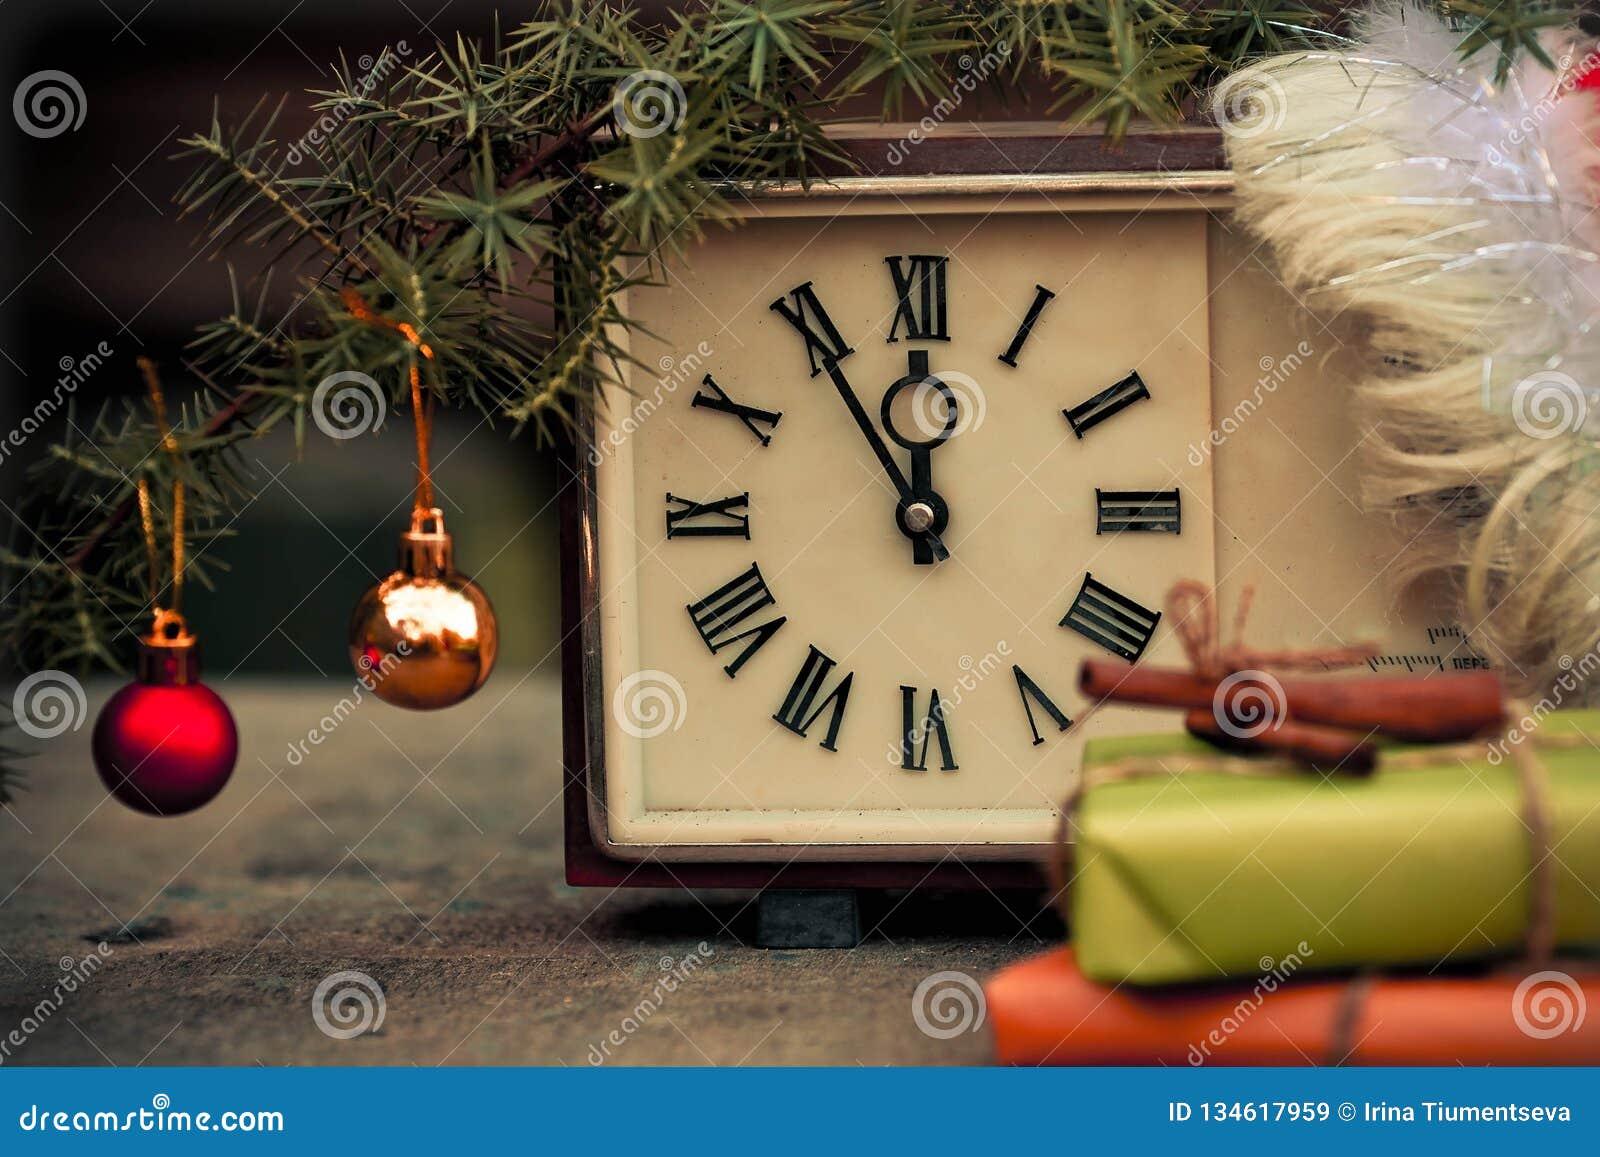 Christmas Countdown New Year Clock Stock Image - Image of ...